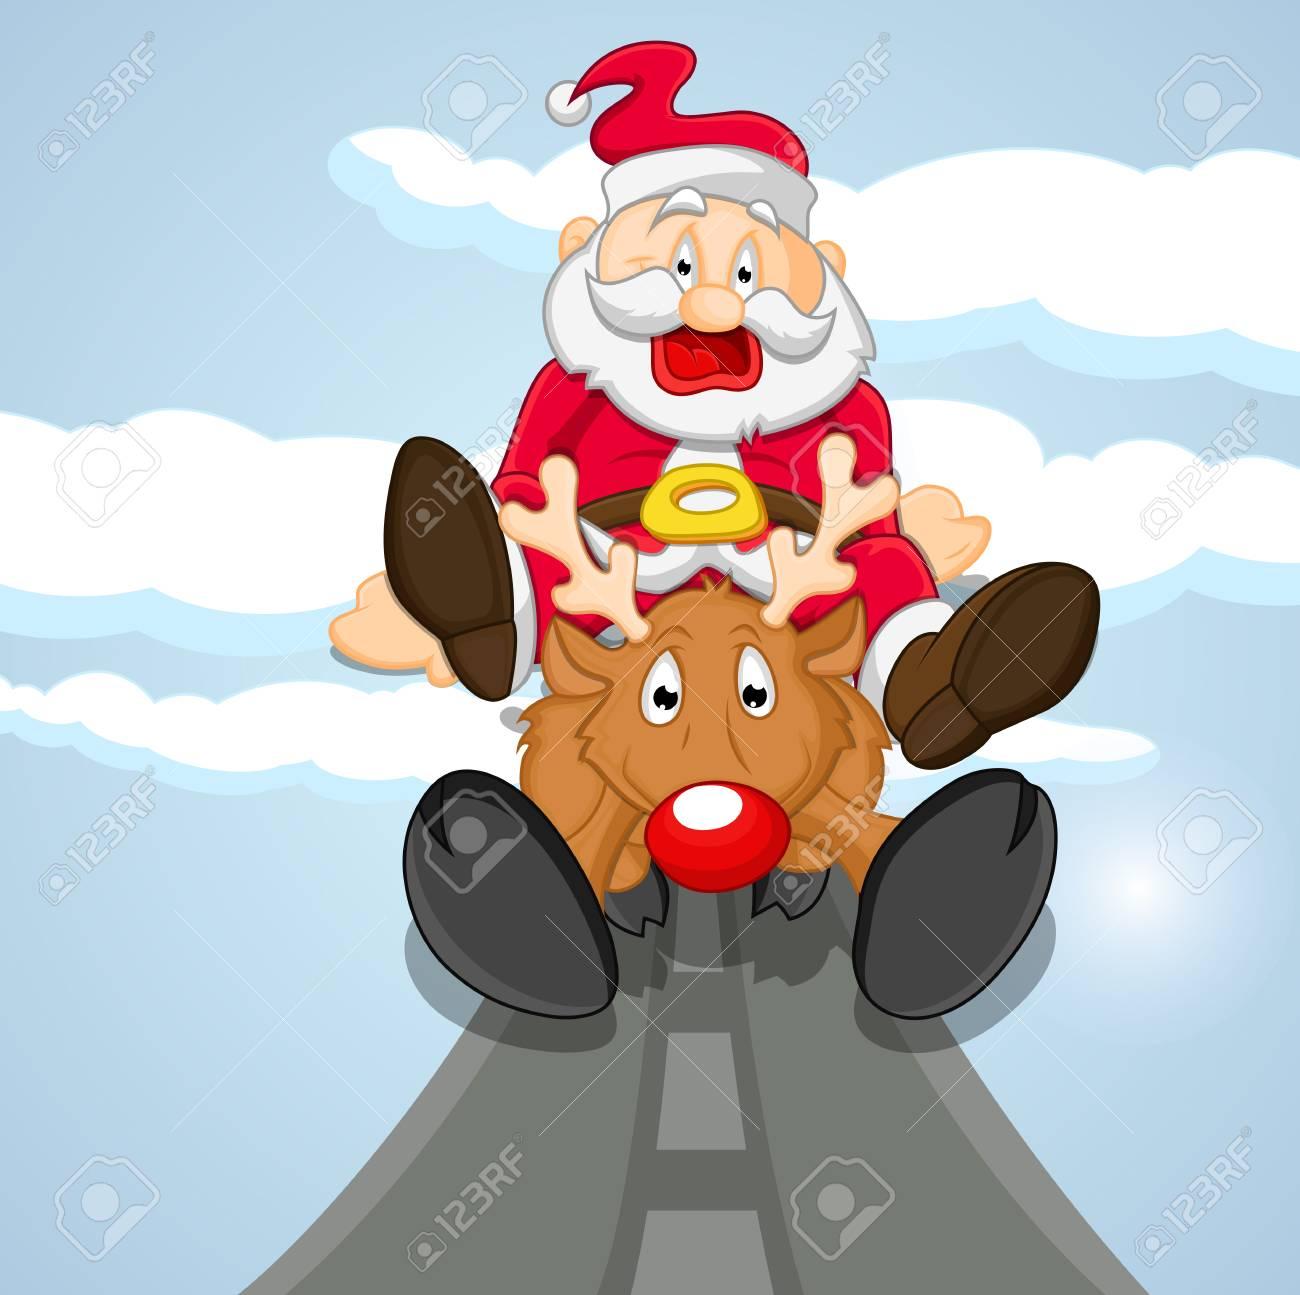 Funny Santa Coming on Reindeer Stock Vector - 16832523